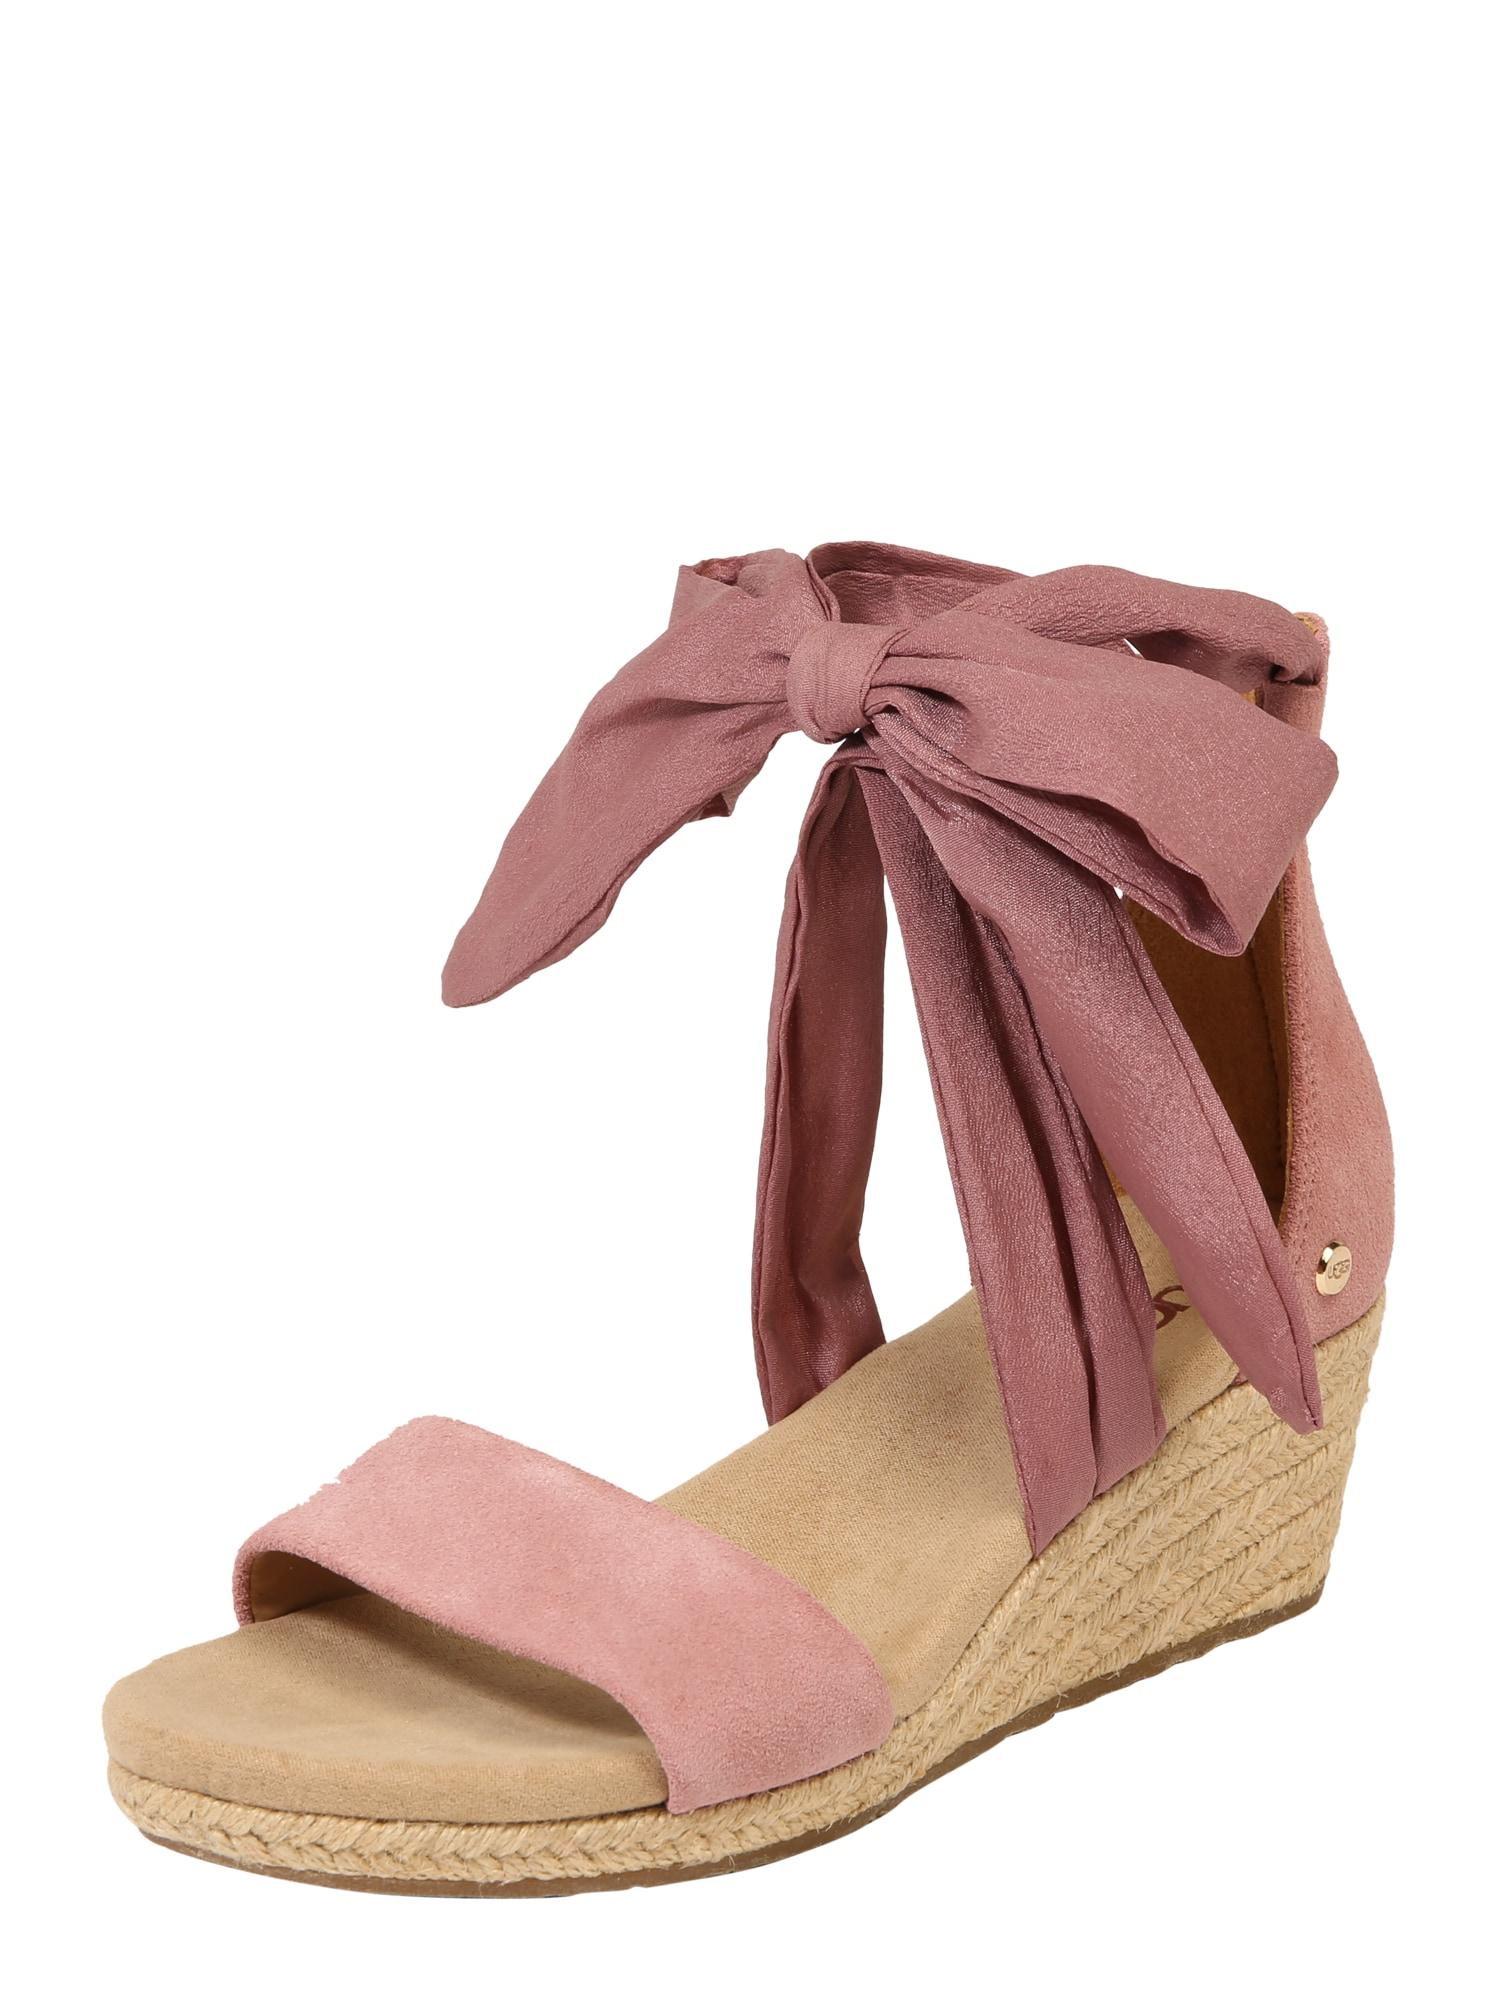 Páskové sandály Trina růžová UGG